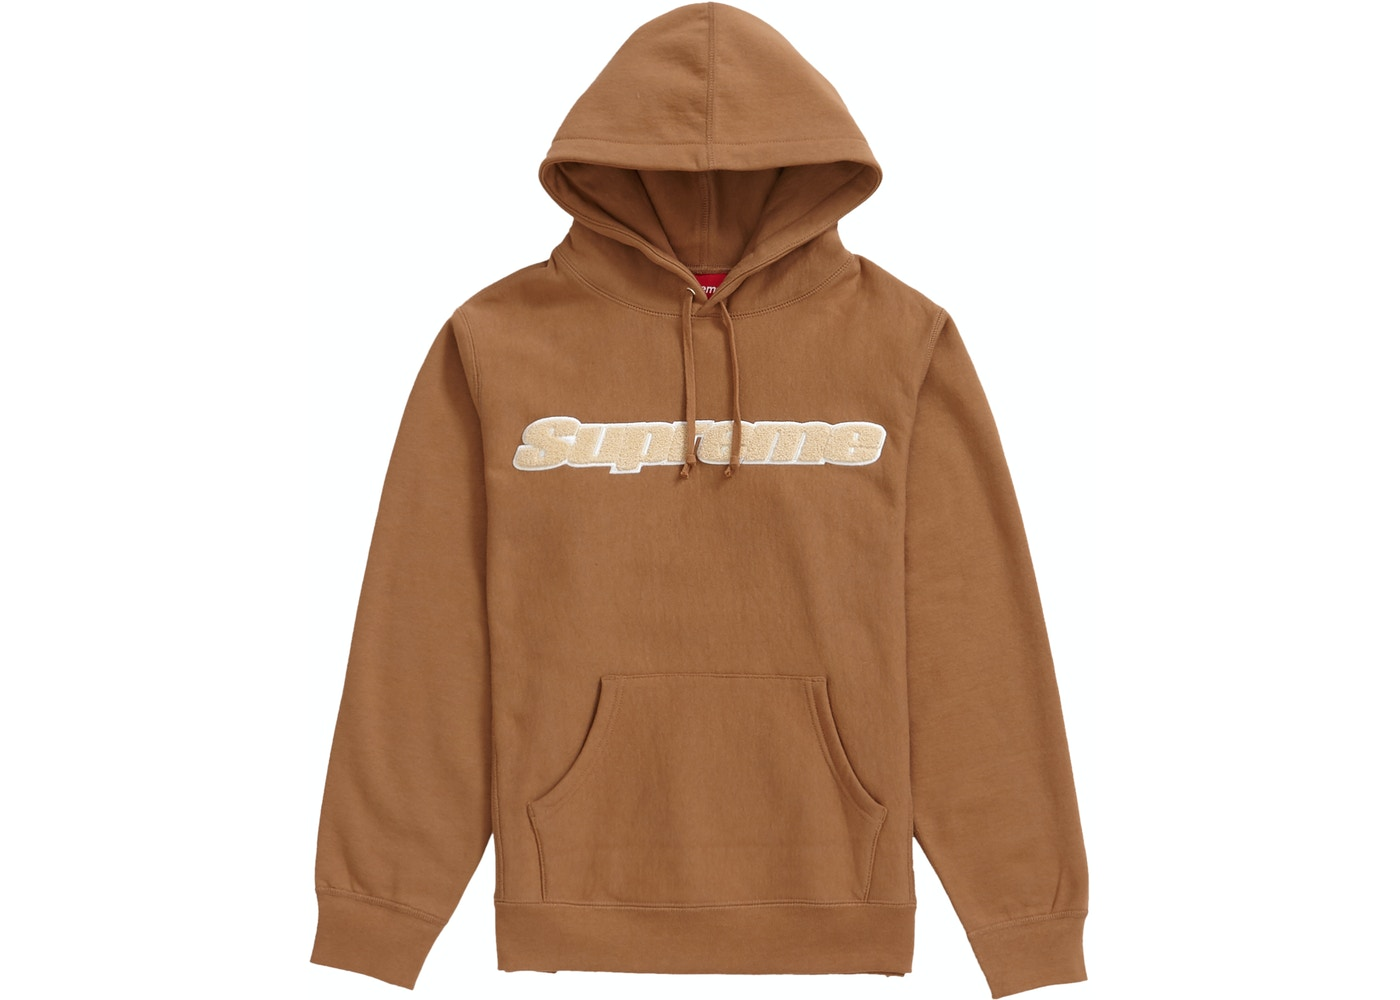 ada83e37 Supreme Chenille Hooded Sweatshirt Brown — HypeAnalyzer